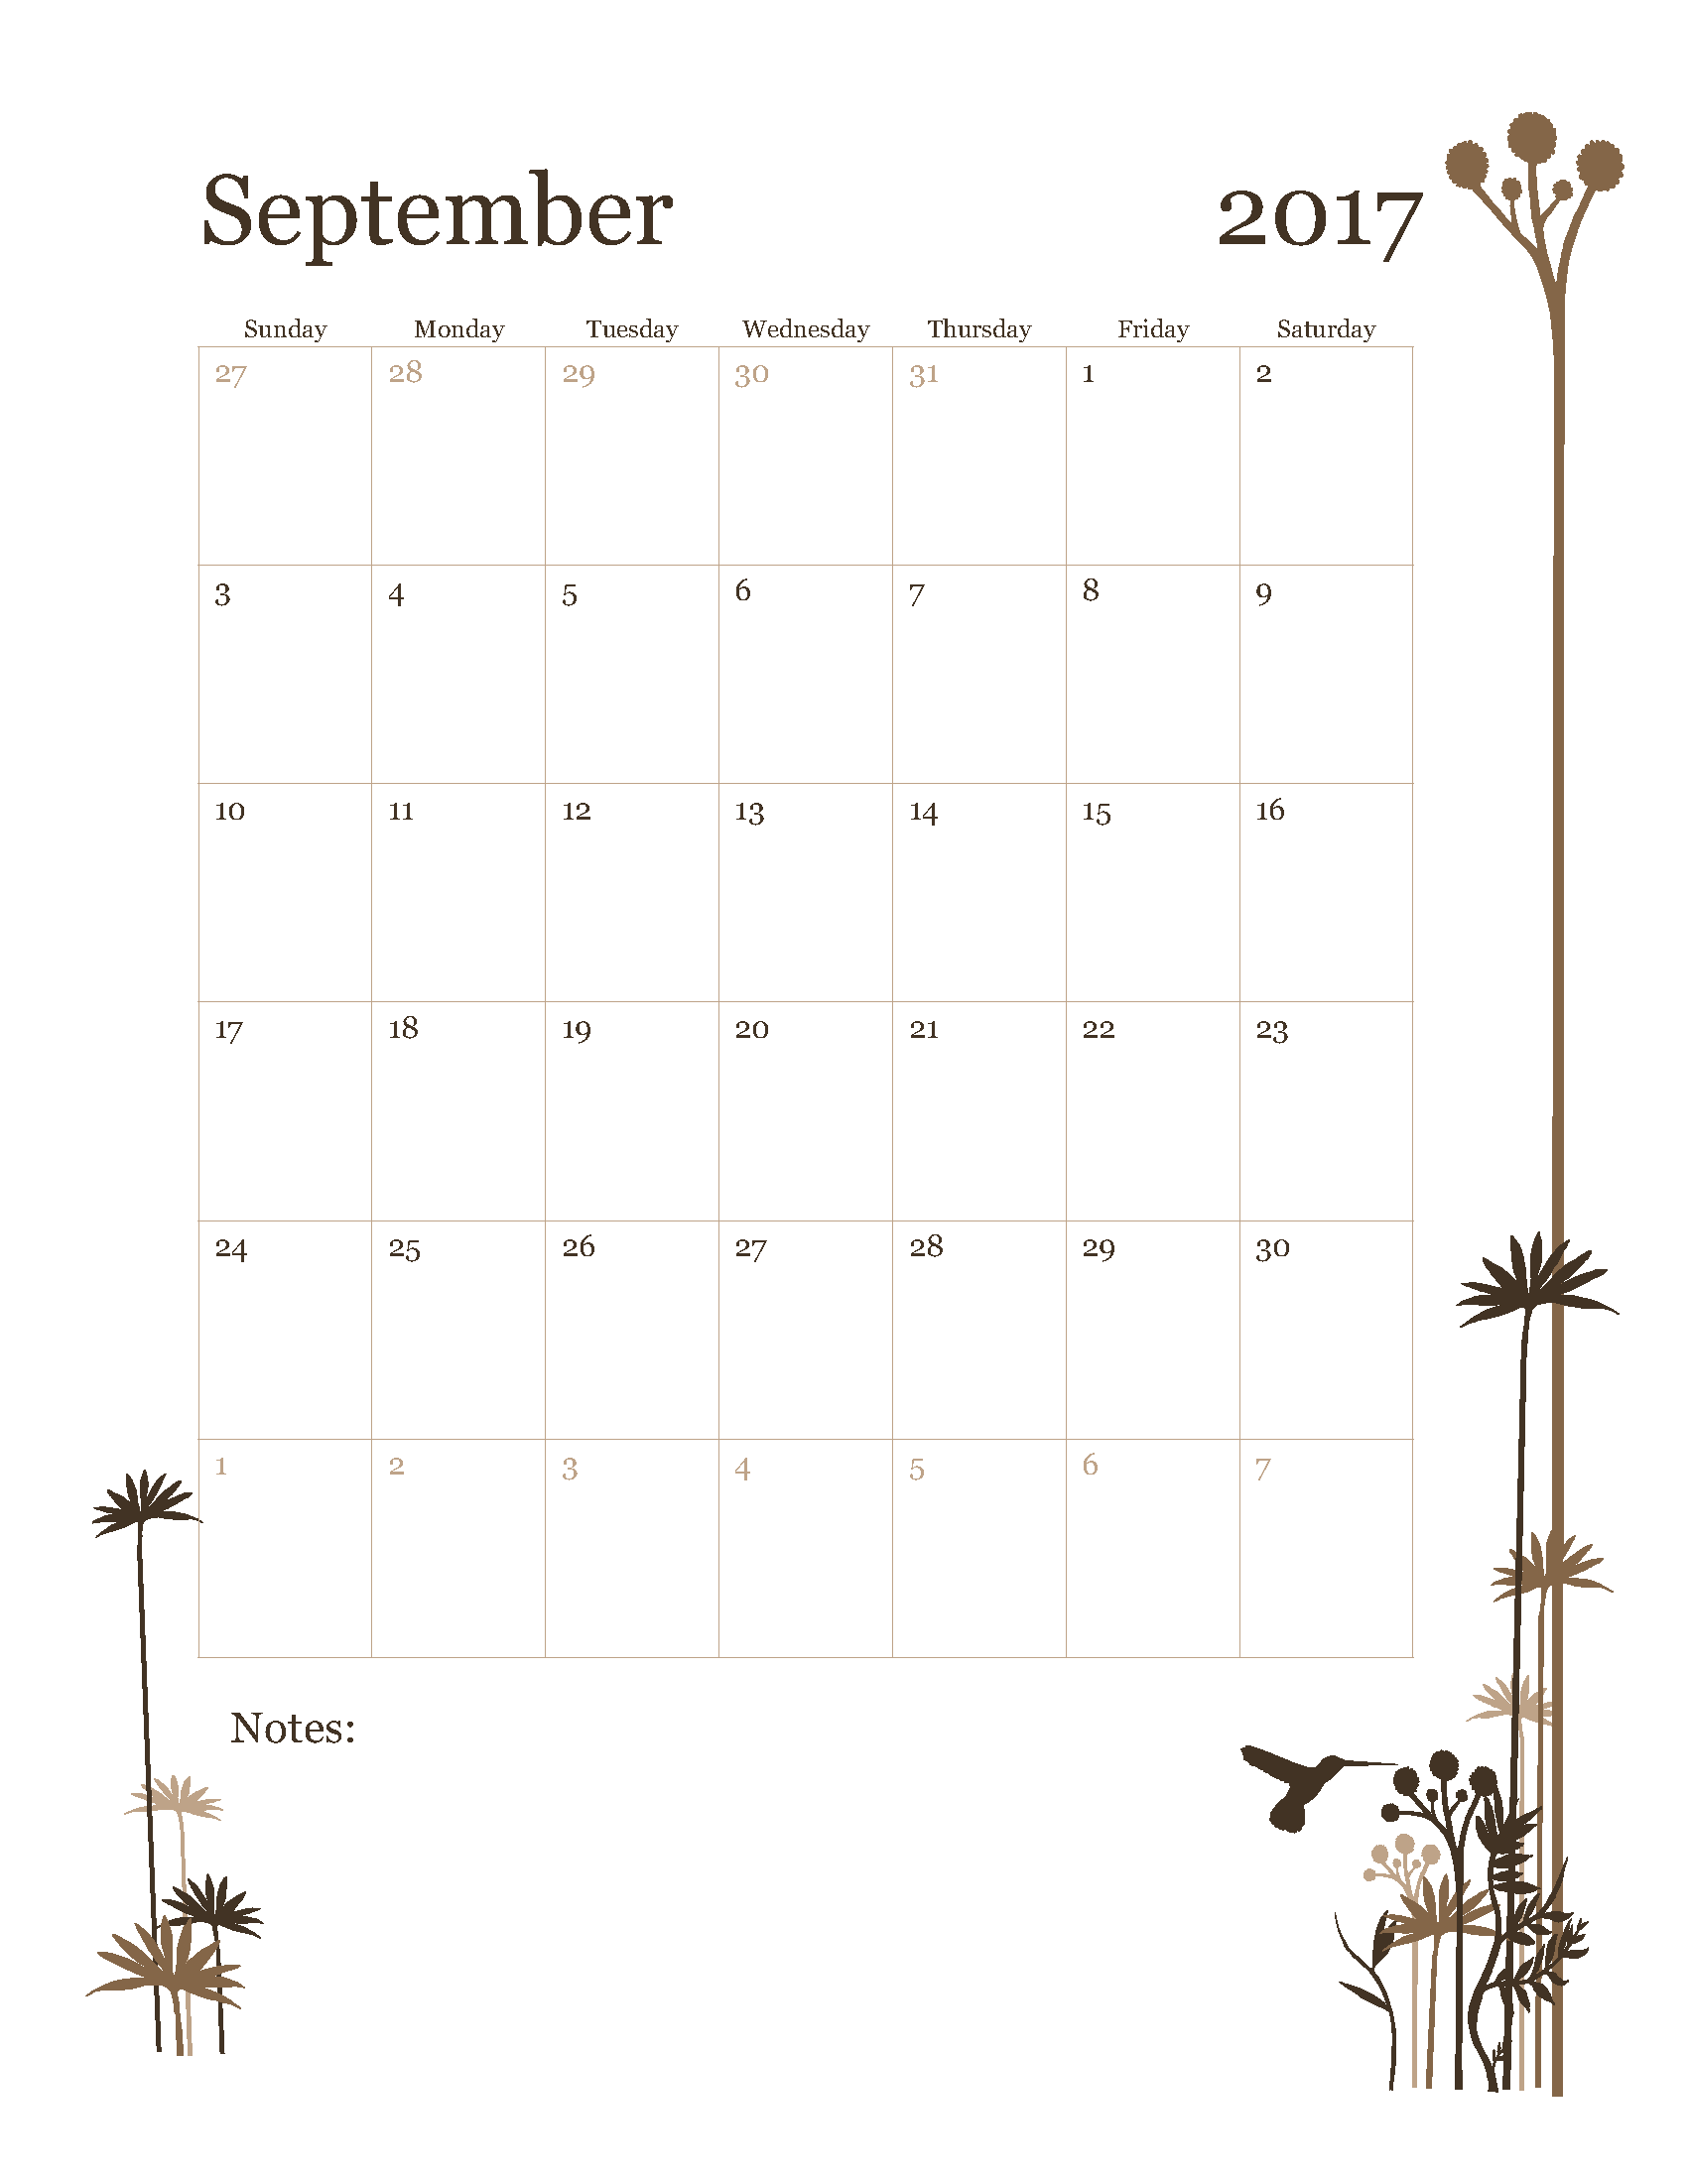 Free September 2017 Calendar Template Printable Start on Sunday - HummingBird design